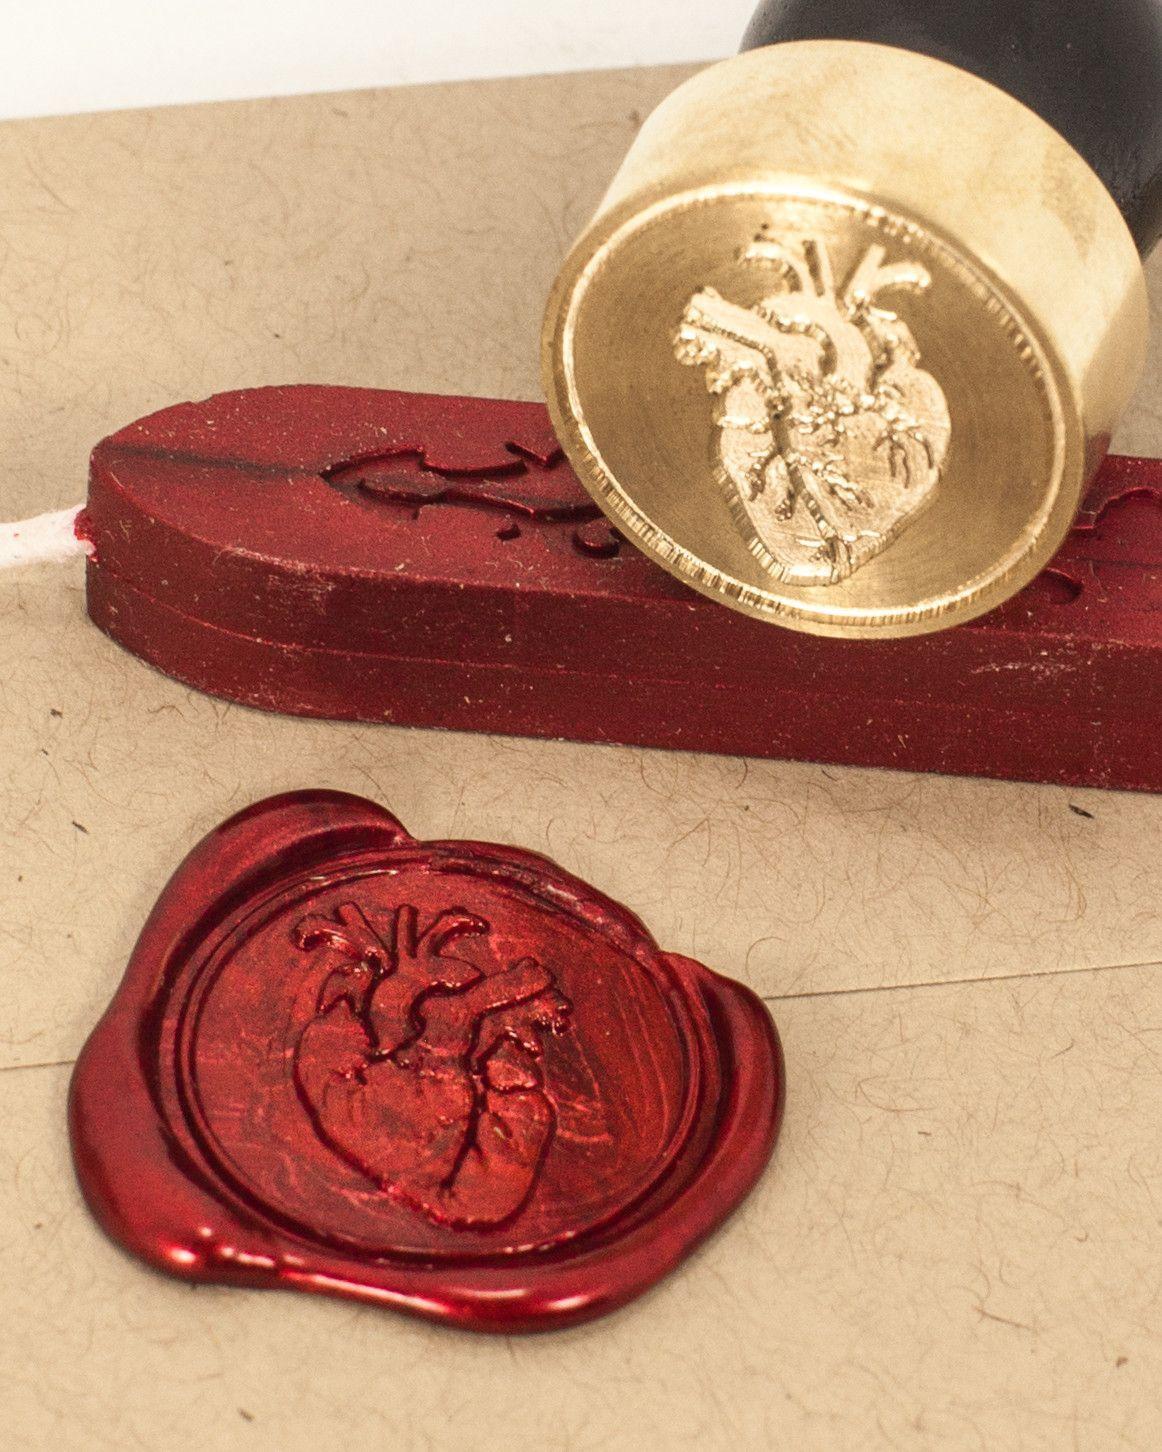 Anatomical Heart Wax Seal Kit   Anatomical heart, Wax seals and ...